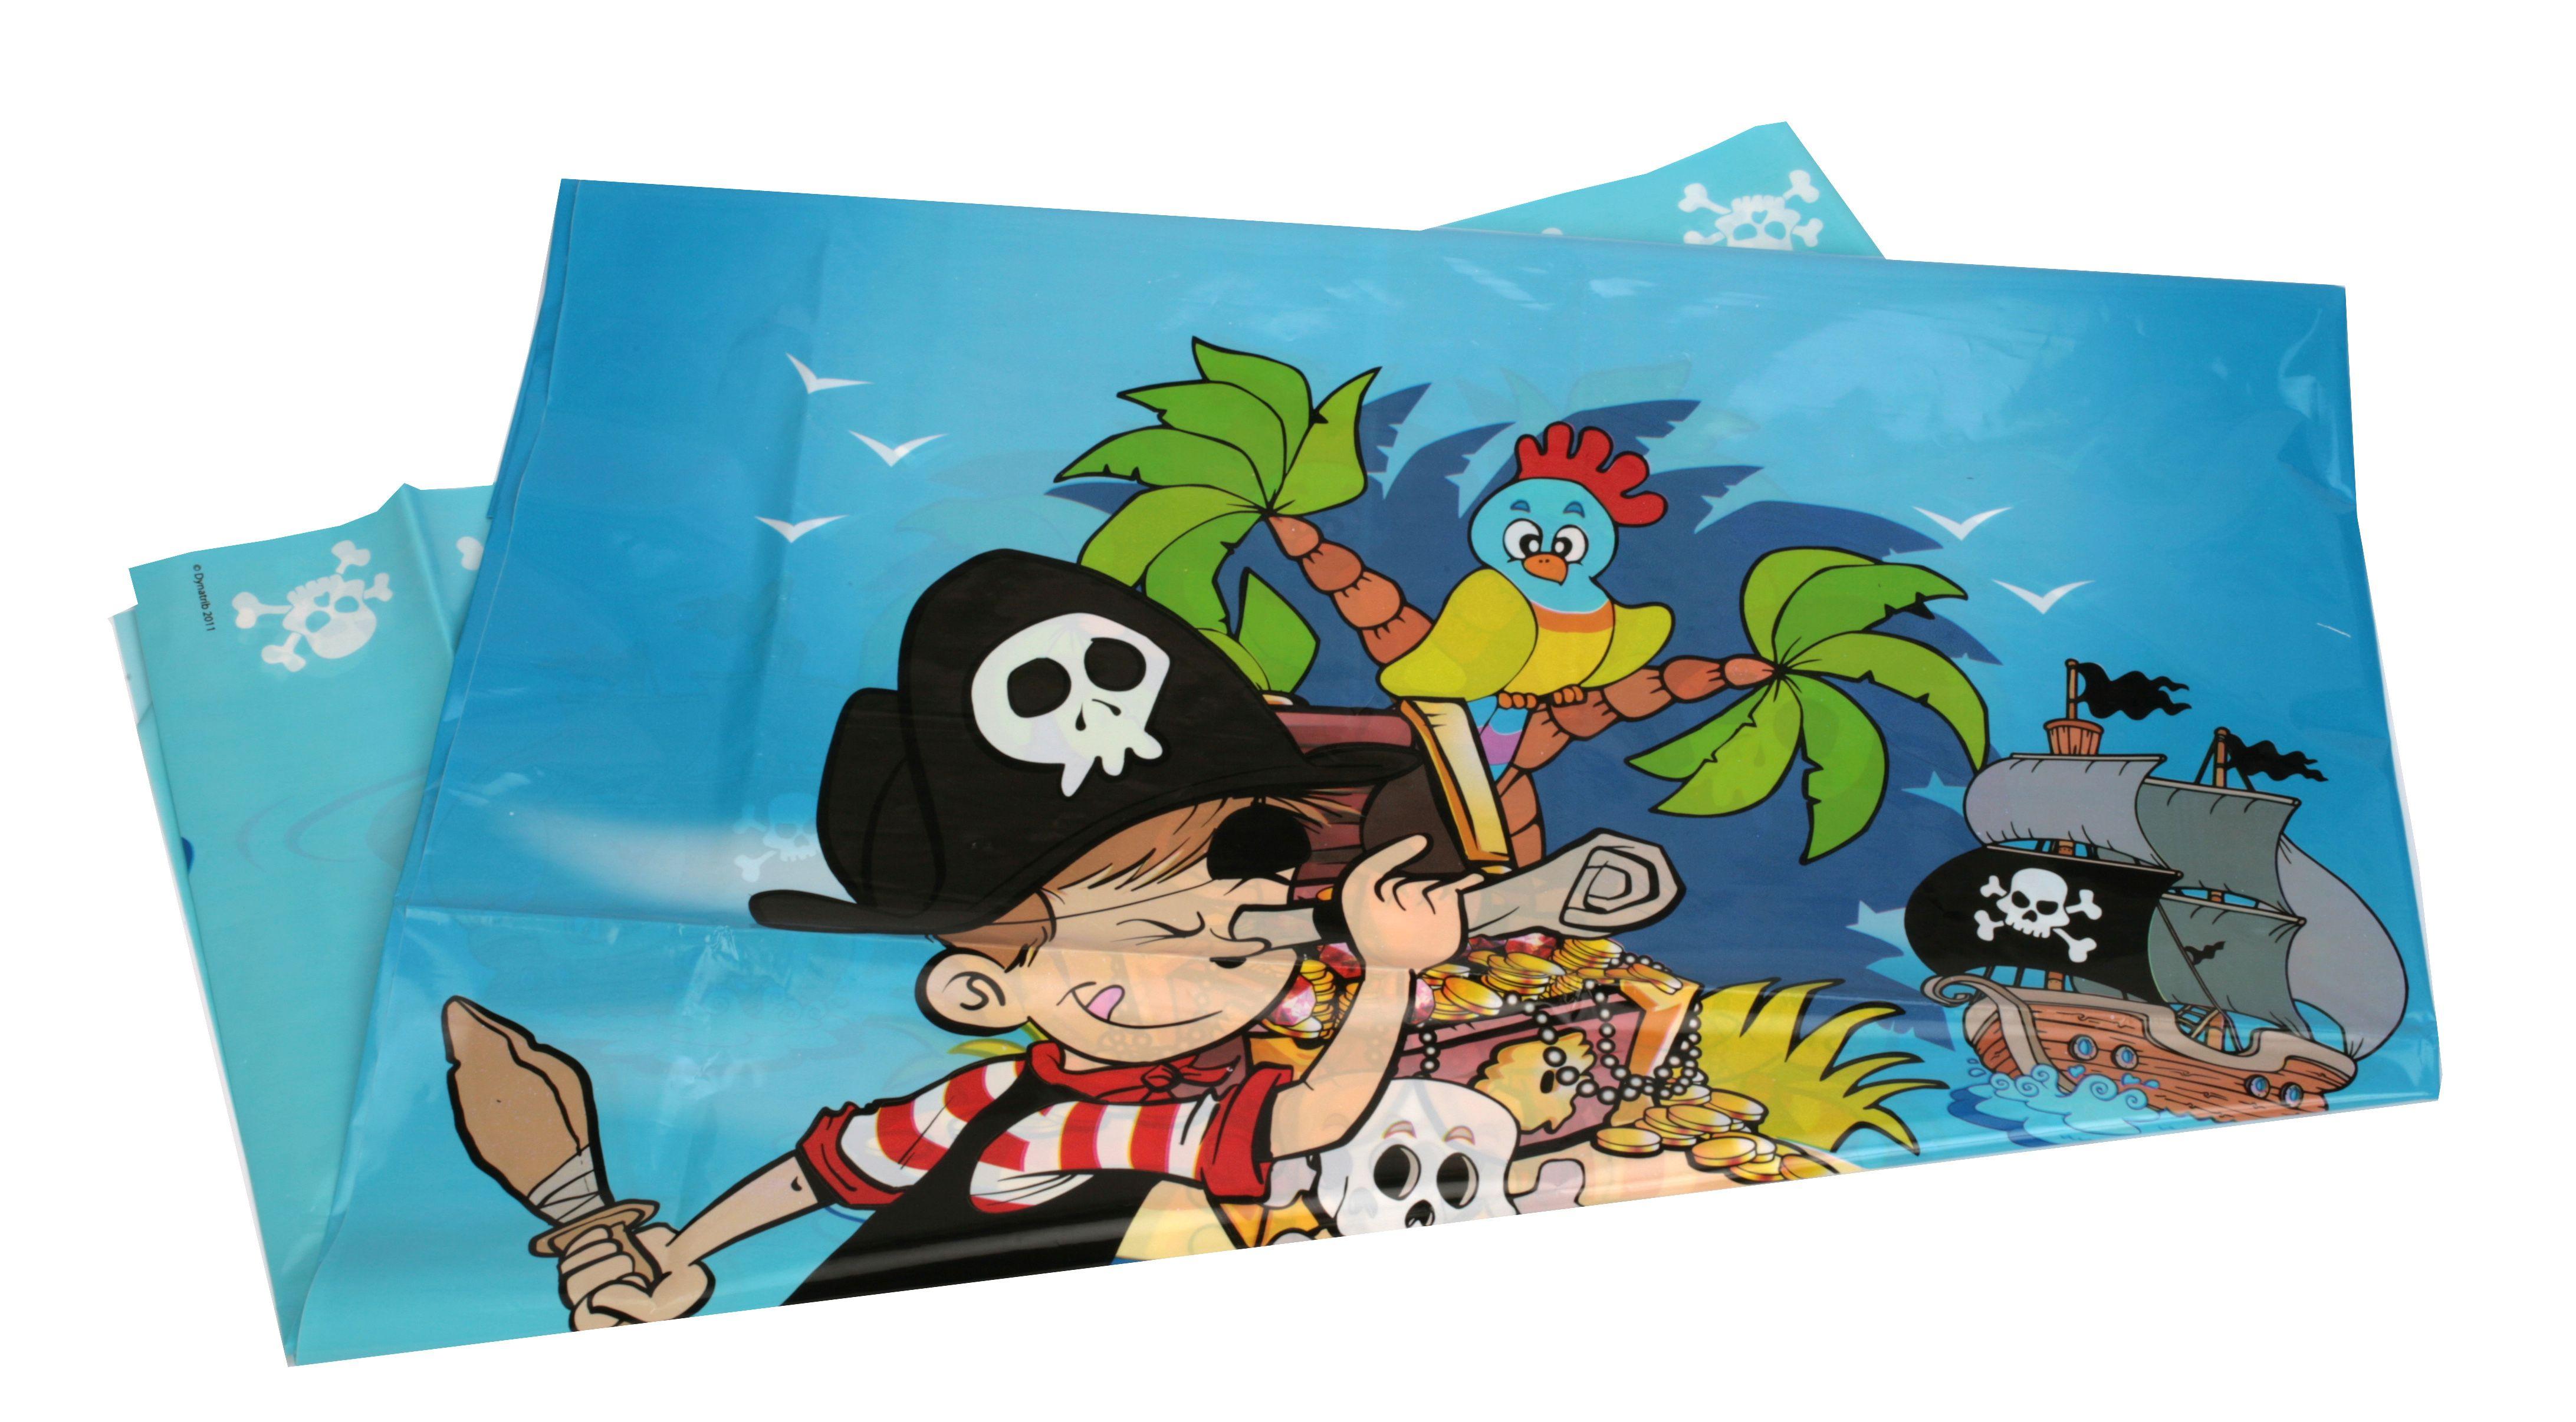 Nappe plastique 130x180cm Pirate DYNASTRIB